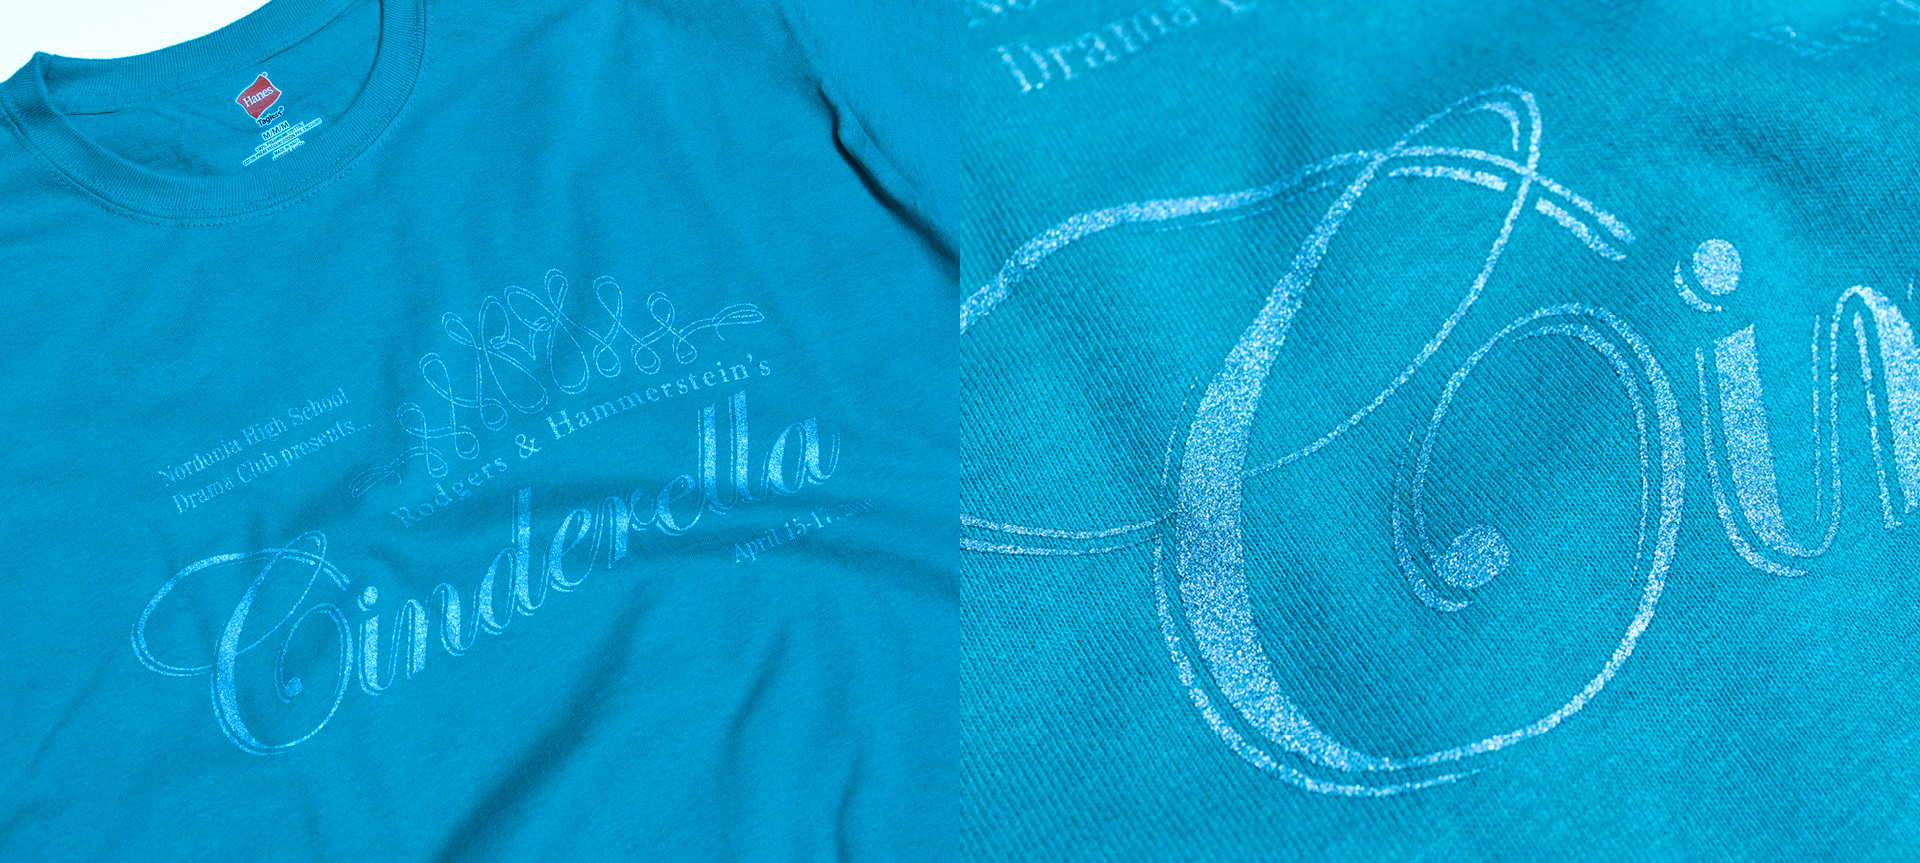 Cinderella_shirt.jpg